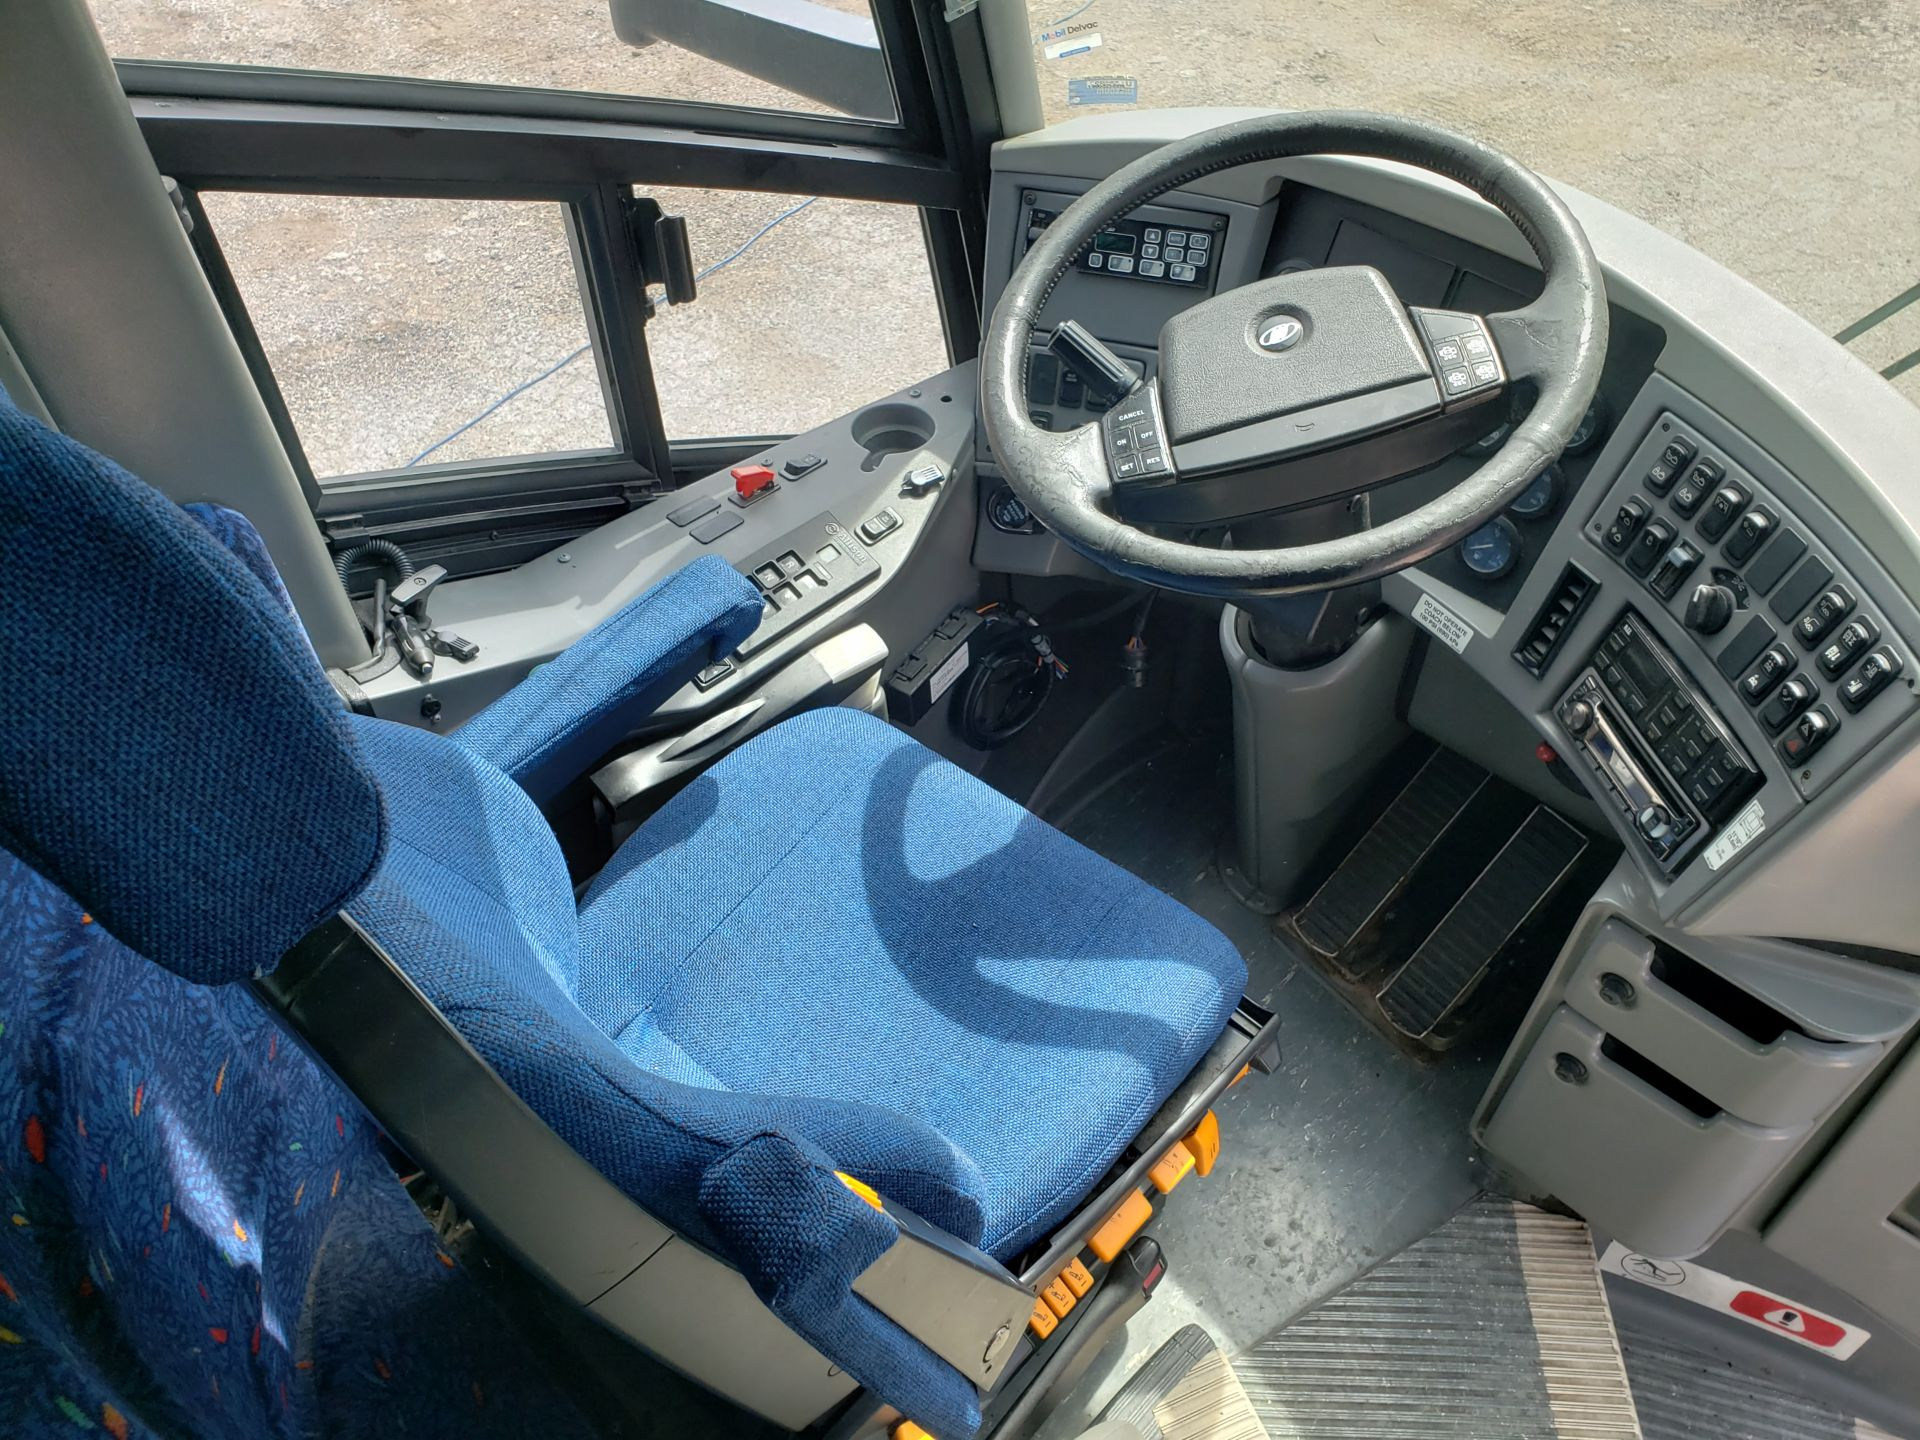 2005 MCI J4500 56-Pass Kneeling Coach Bus - Image 6 of 18